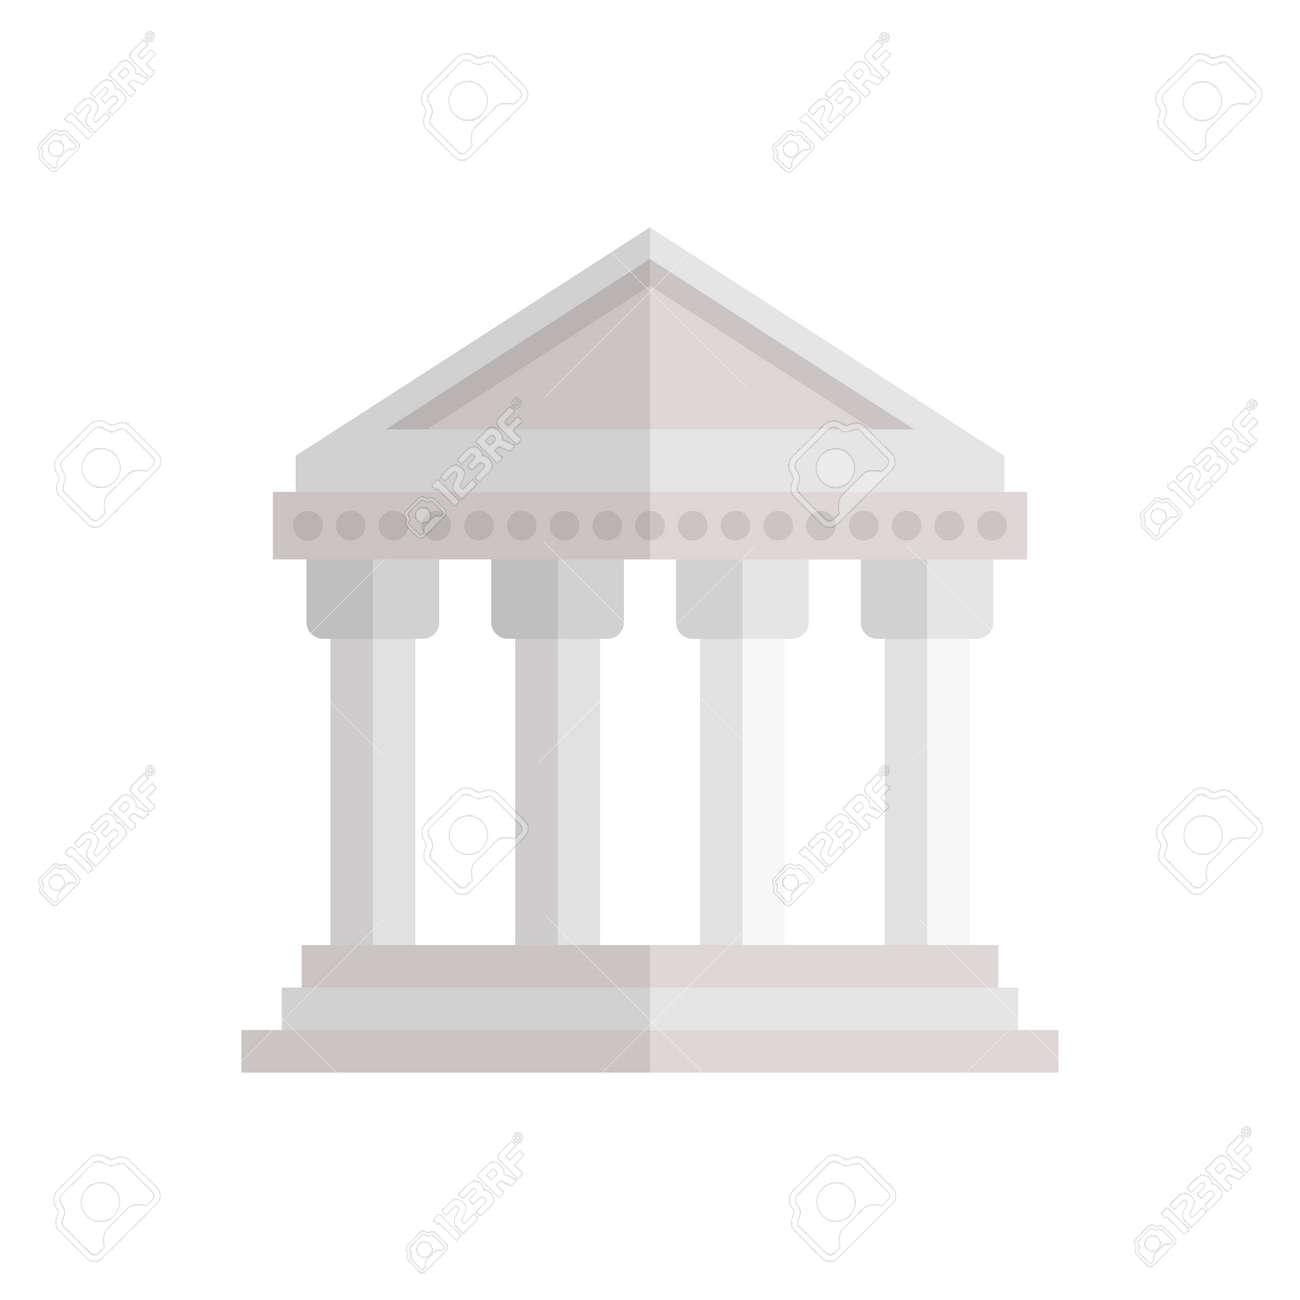 Athens building icon design - 155540212